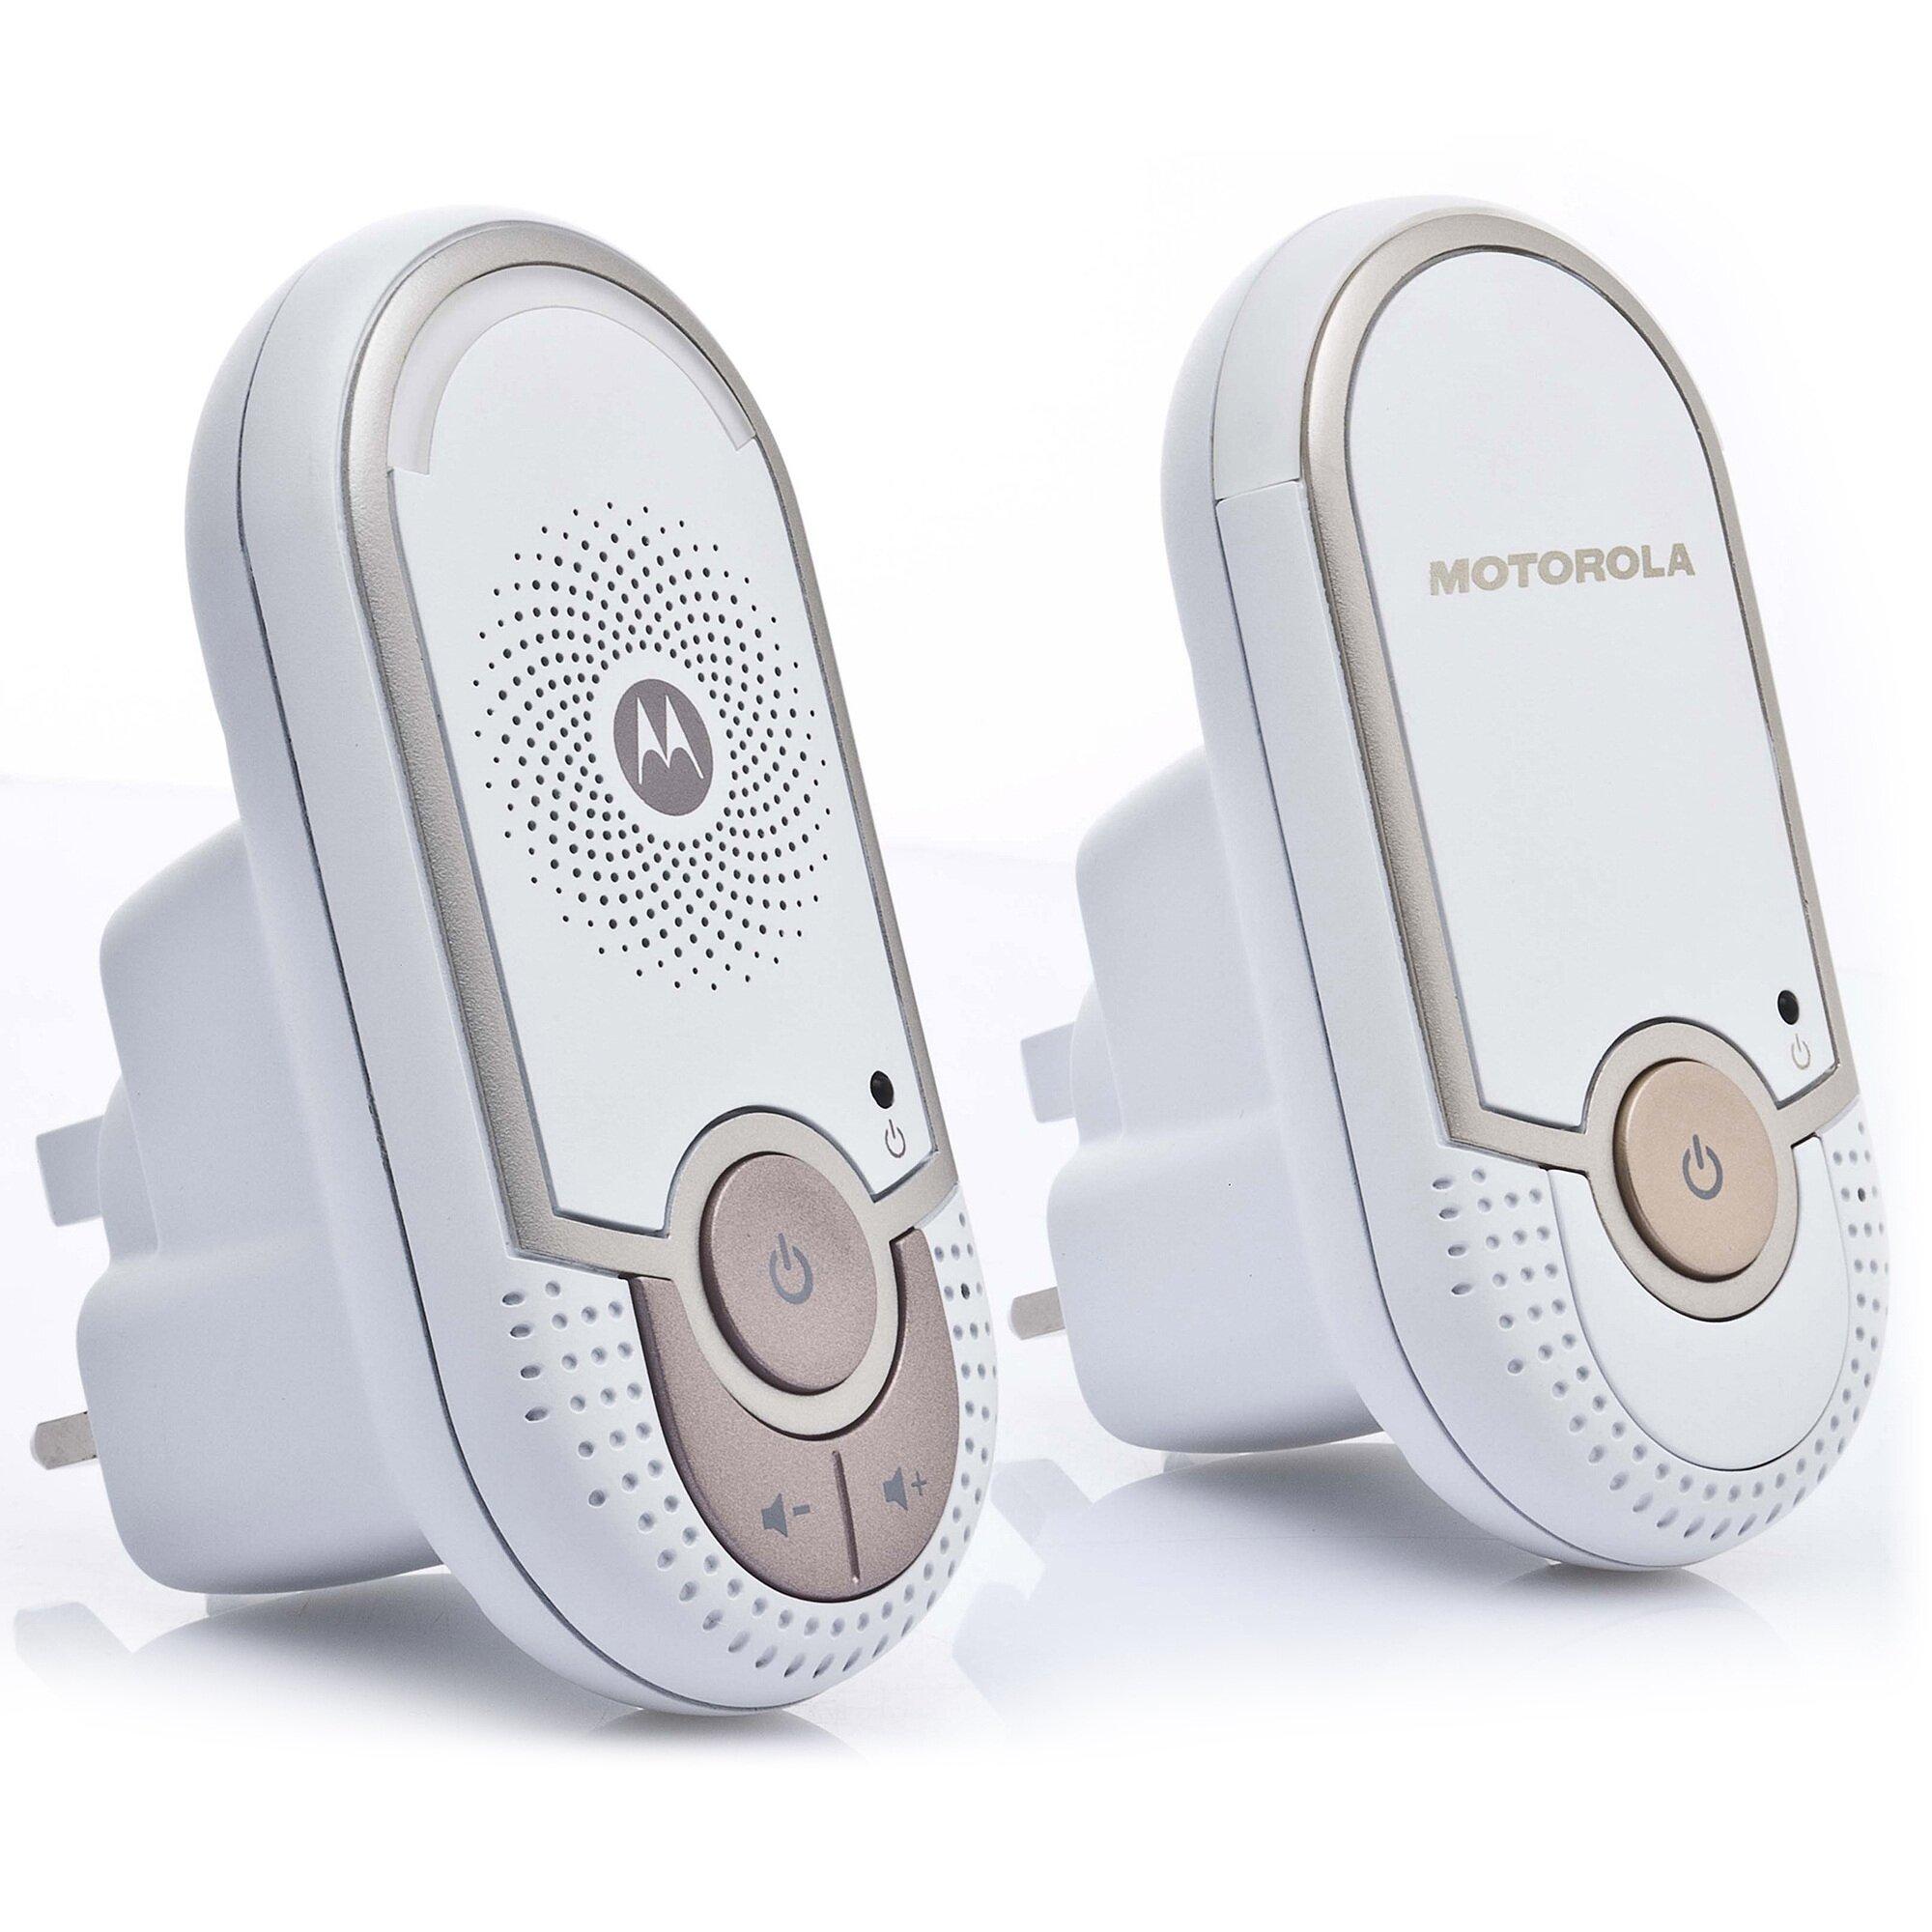 Motorola Babyphone MBP8, 300 m